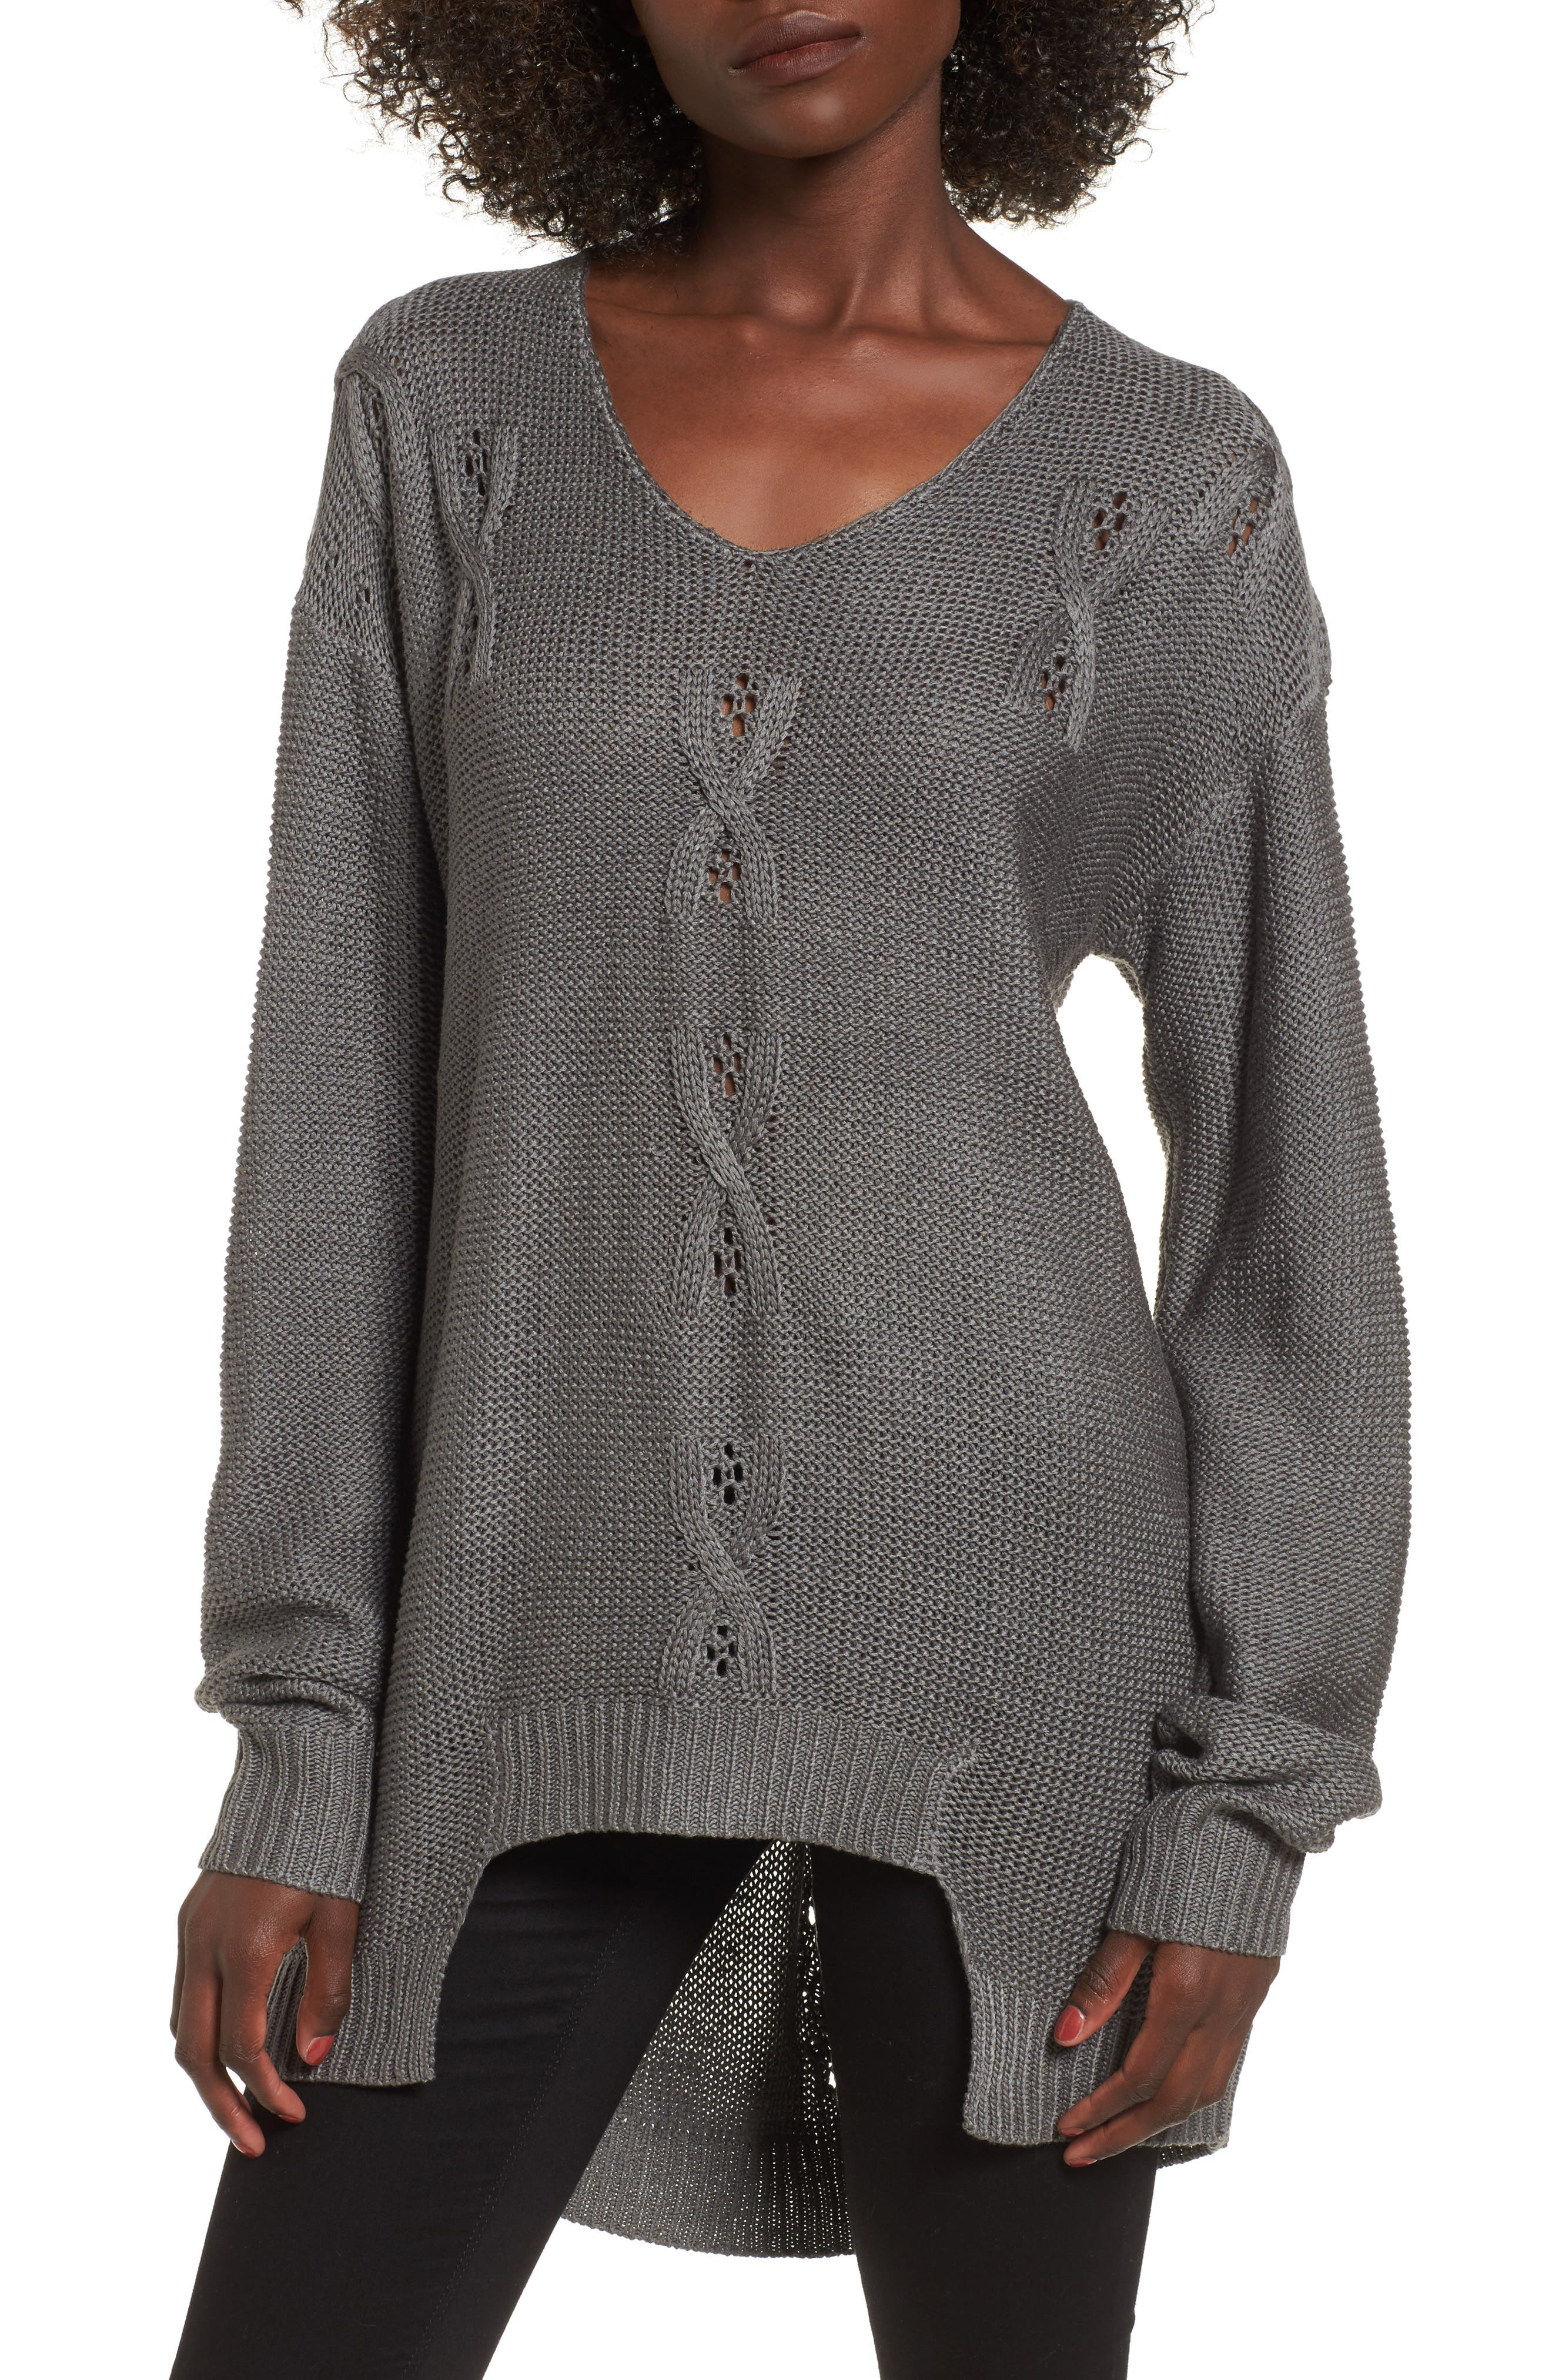 Patti Longline Sweater,                             Main thumbnail 1, color,                             021